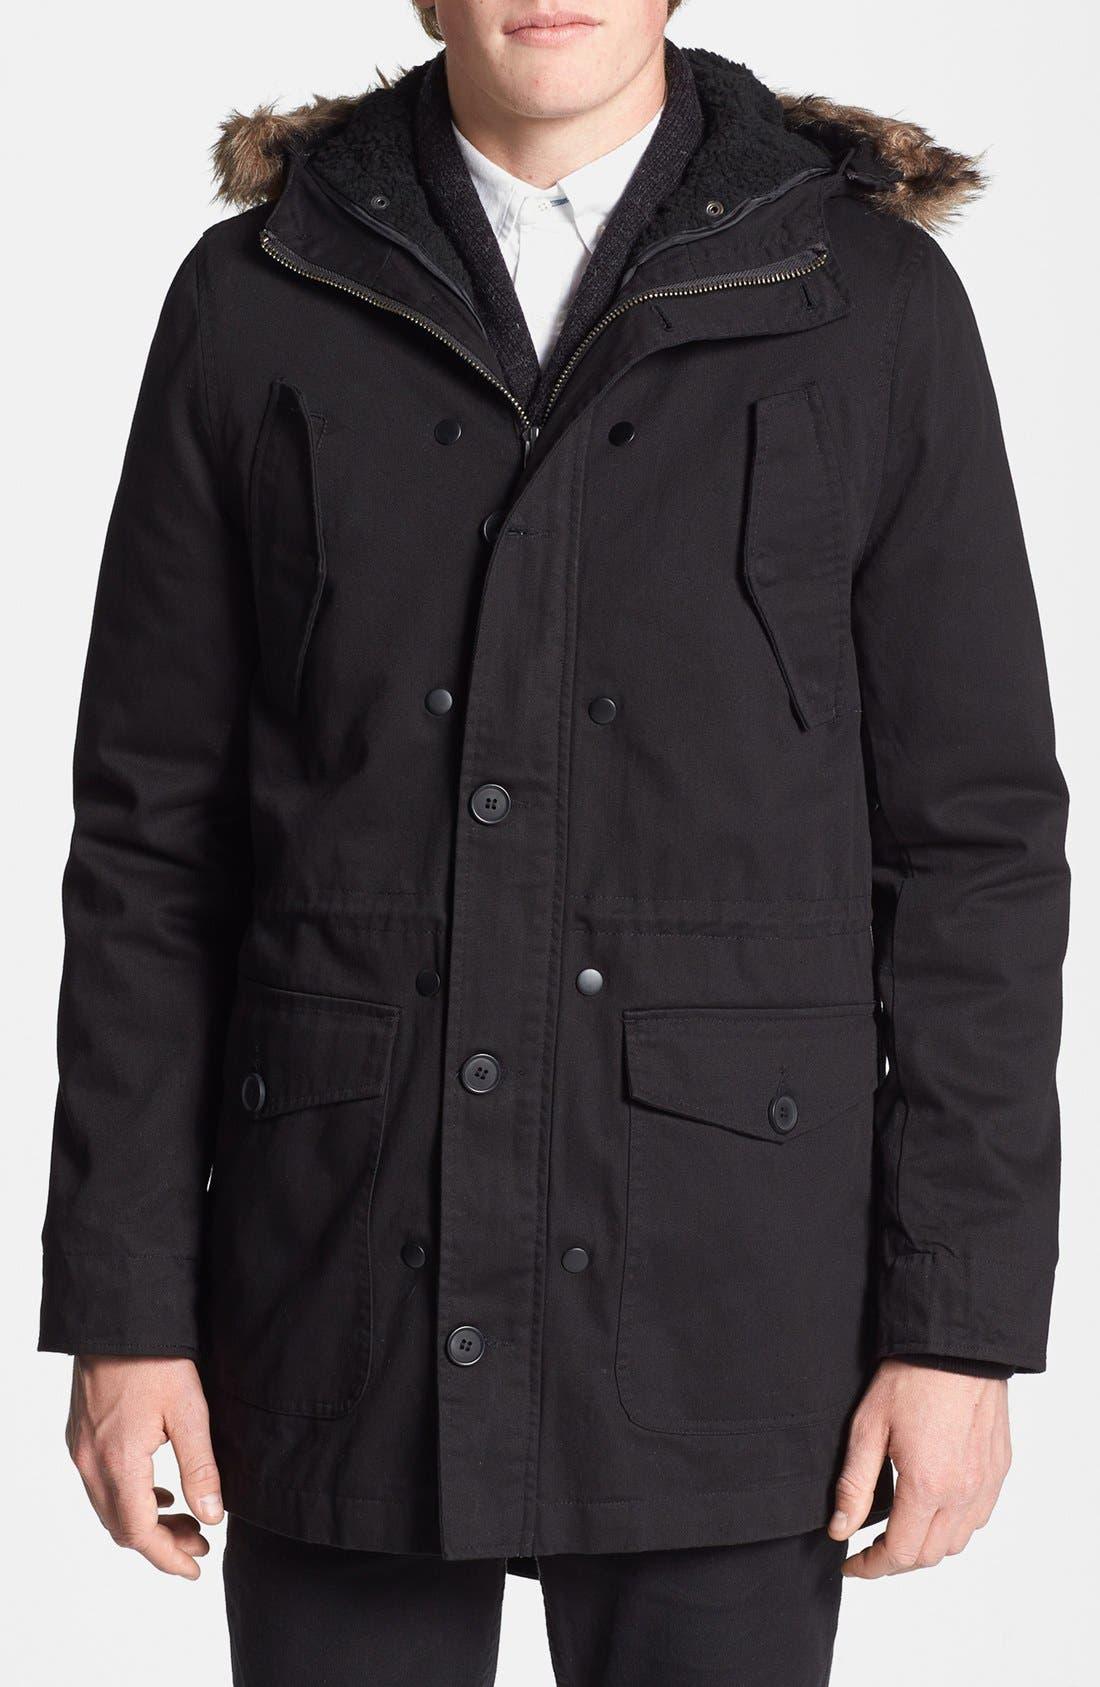 Alternate Image 1 Selected - Topman Fishtail Parka with Detachable Faux Fur Trimmed Hood